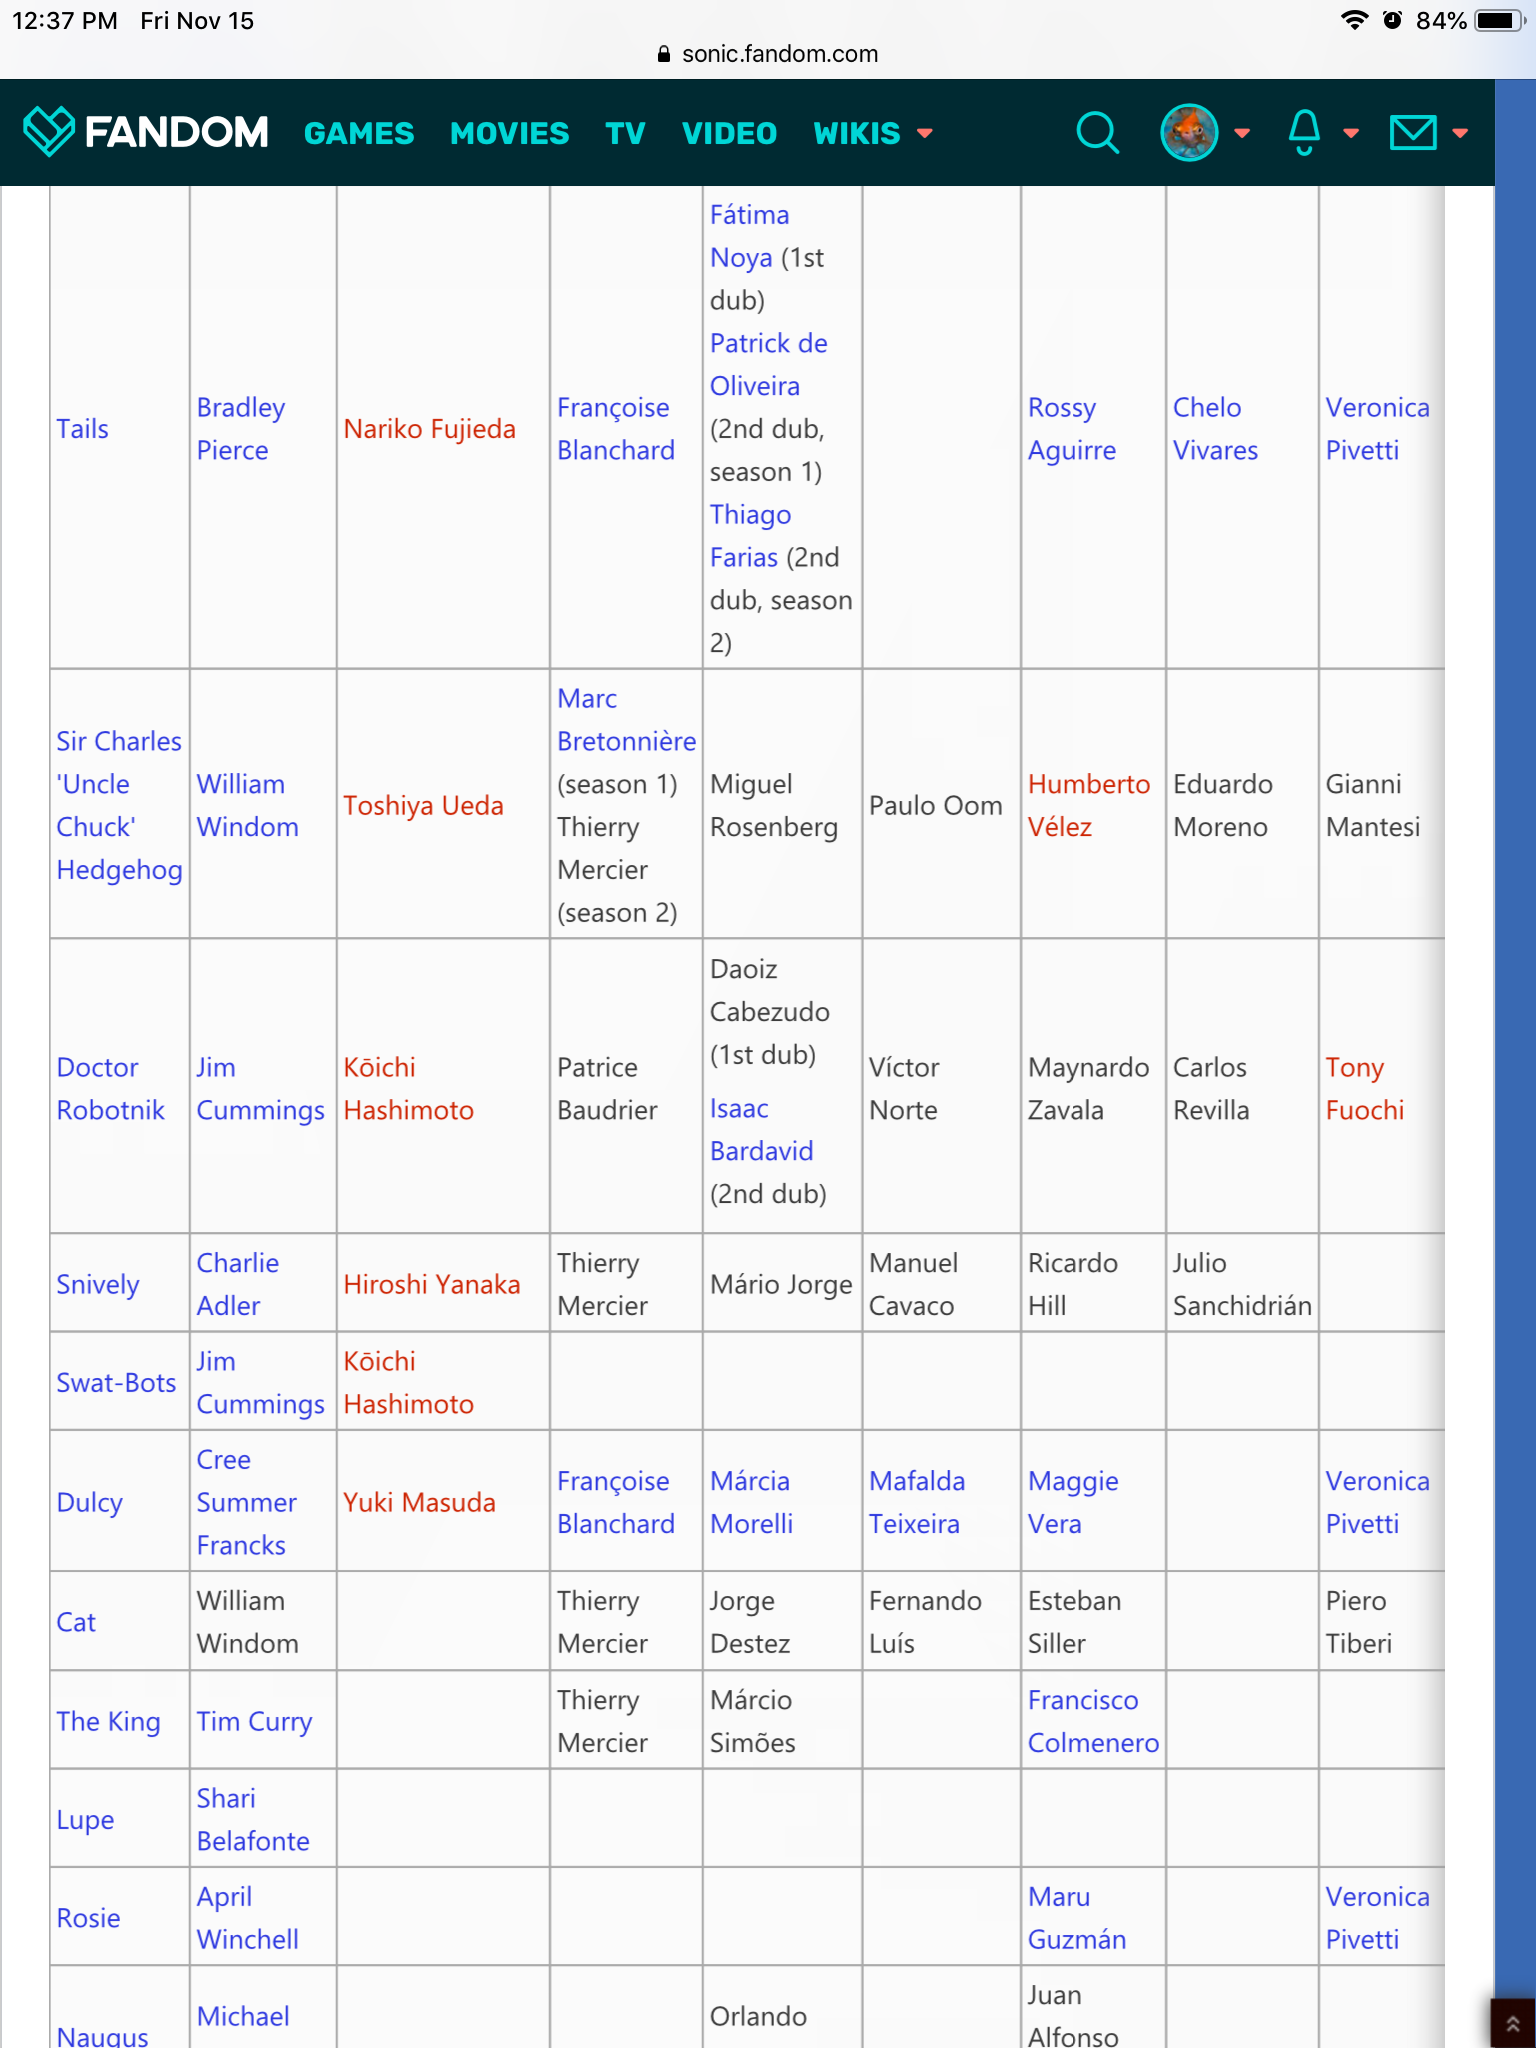 Sonic the Hedgehog Voice Actors Page 2